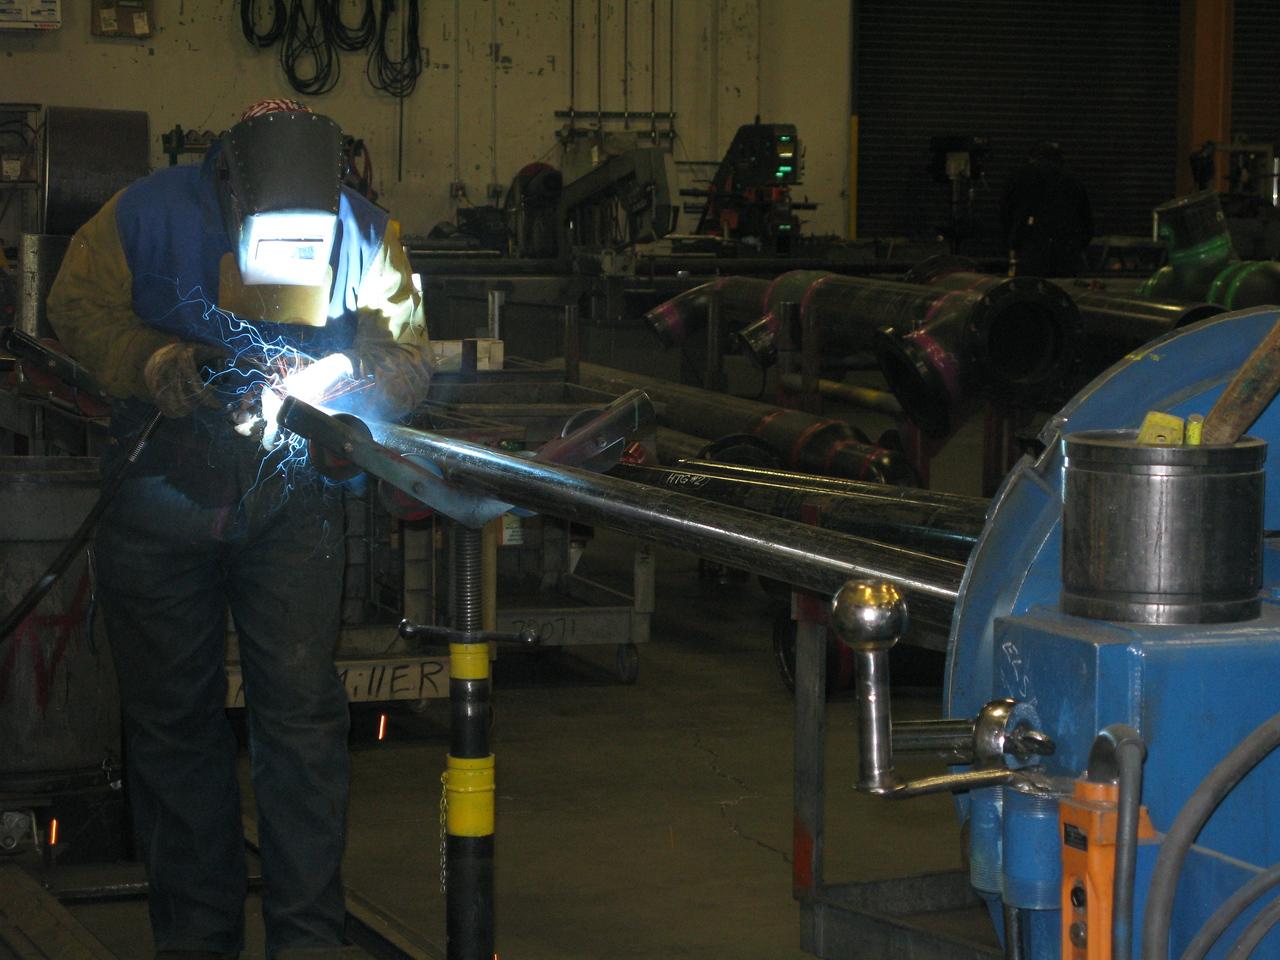 MacDonald-Miller pipe fabrication shop area.